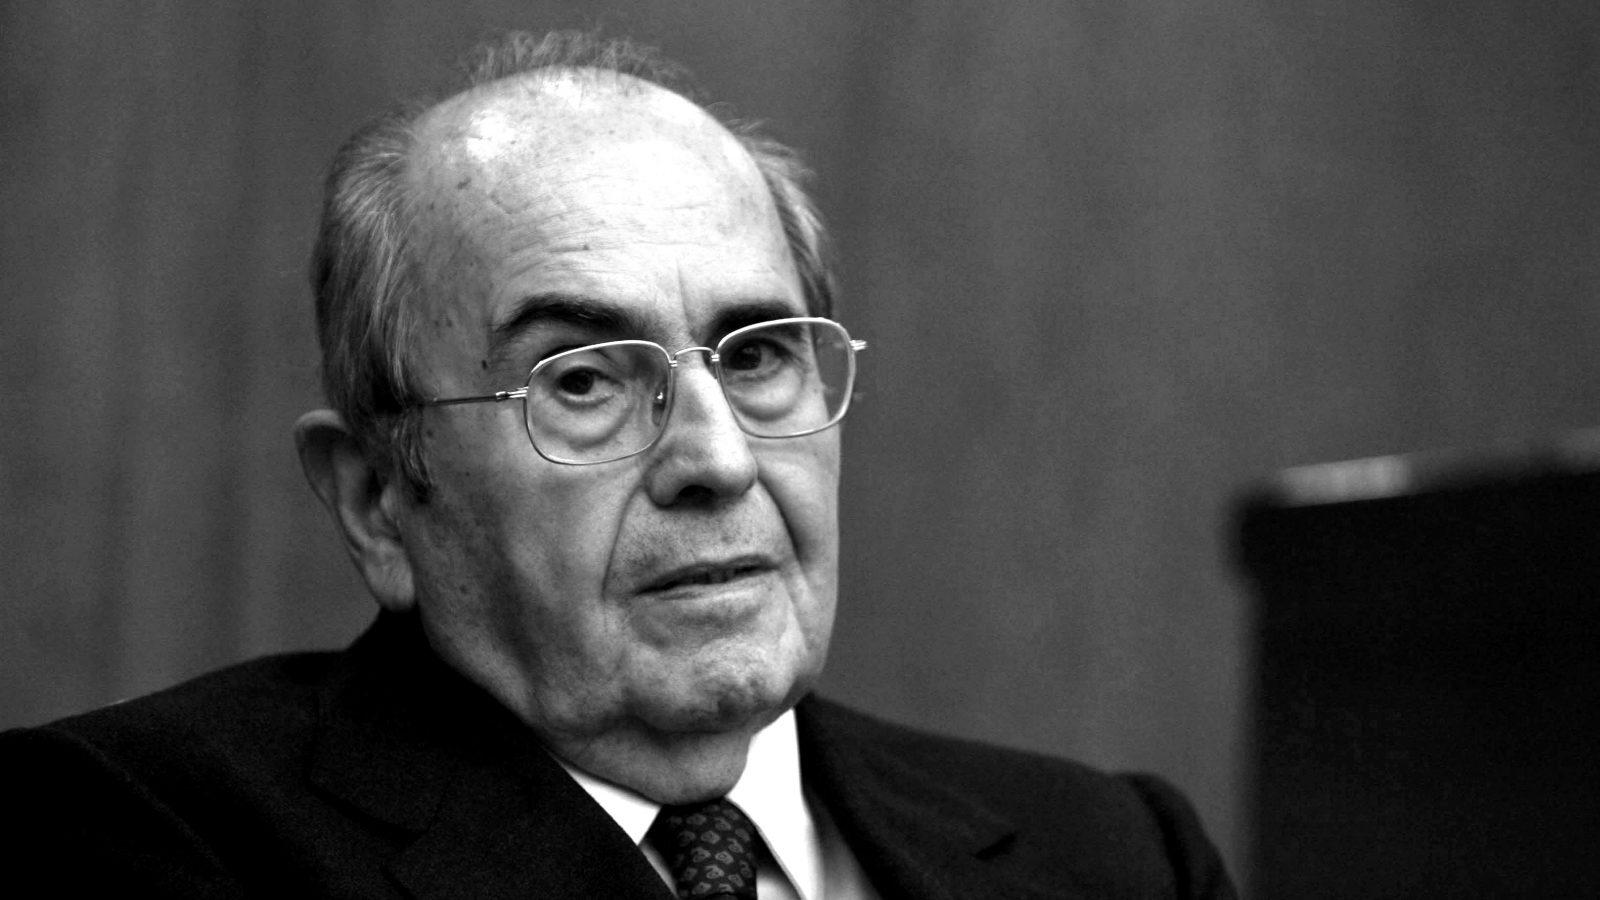 Francesco Merloni, foto del 2008 (fonte: Imagoeconomica)